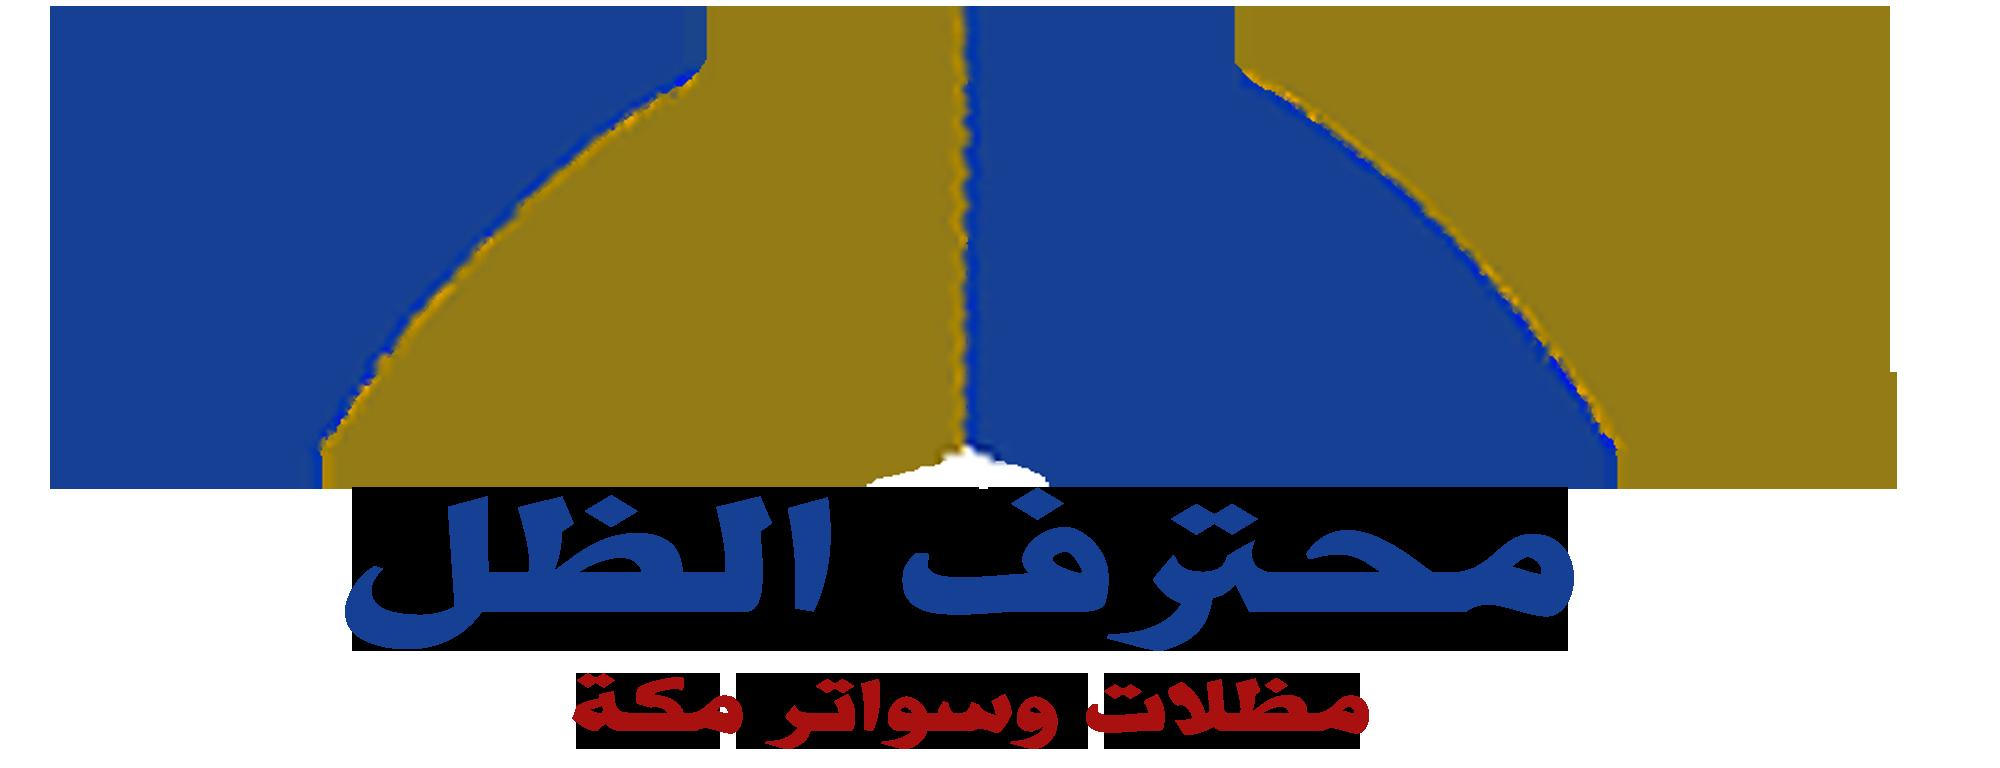 مظلات محترف الظل 0503344200 محترف الظل مظلات وسواتر مكة Marketing Umbrella